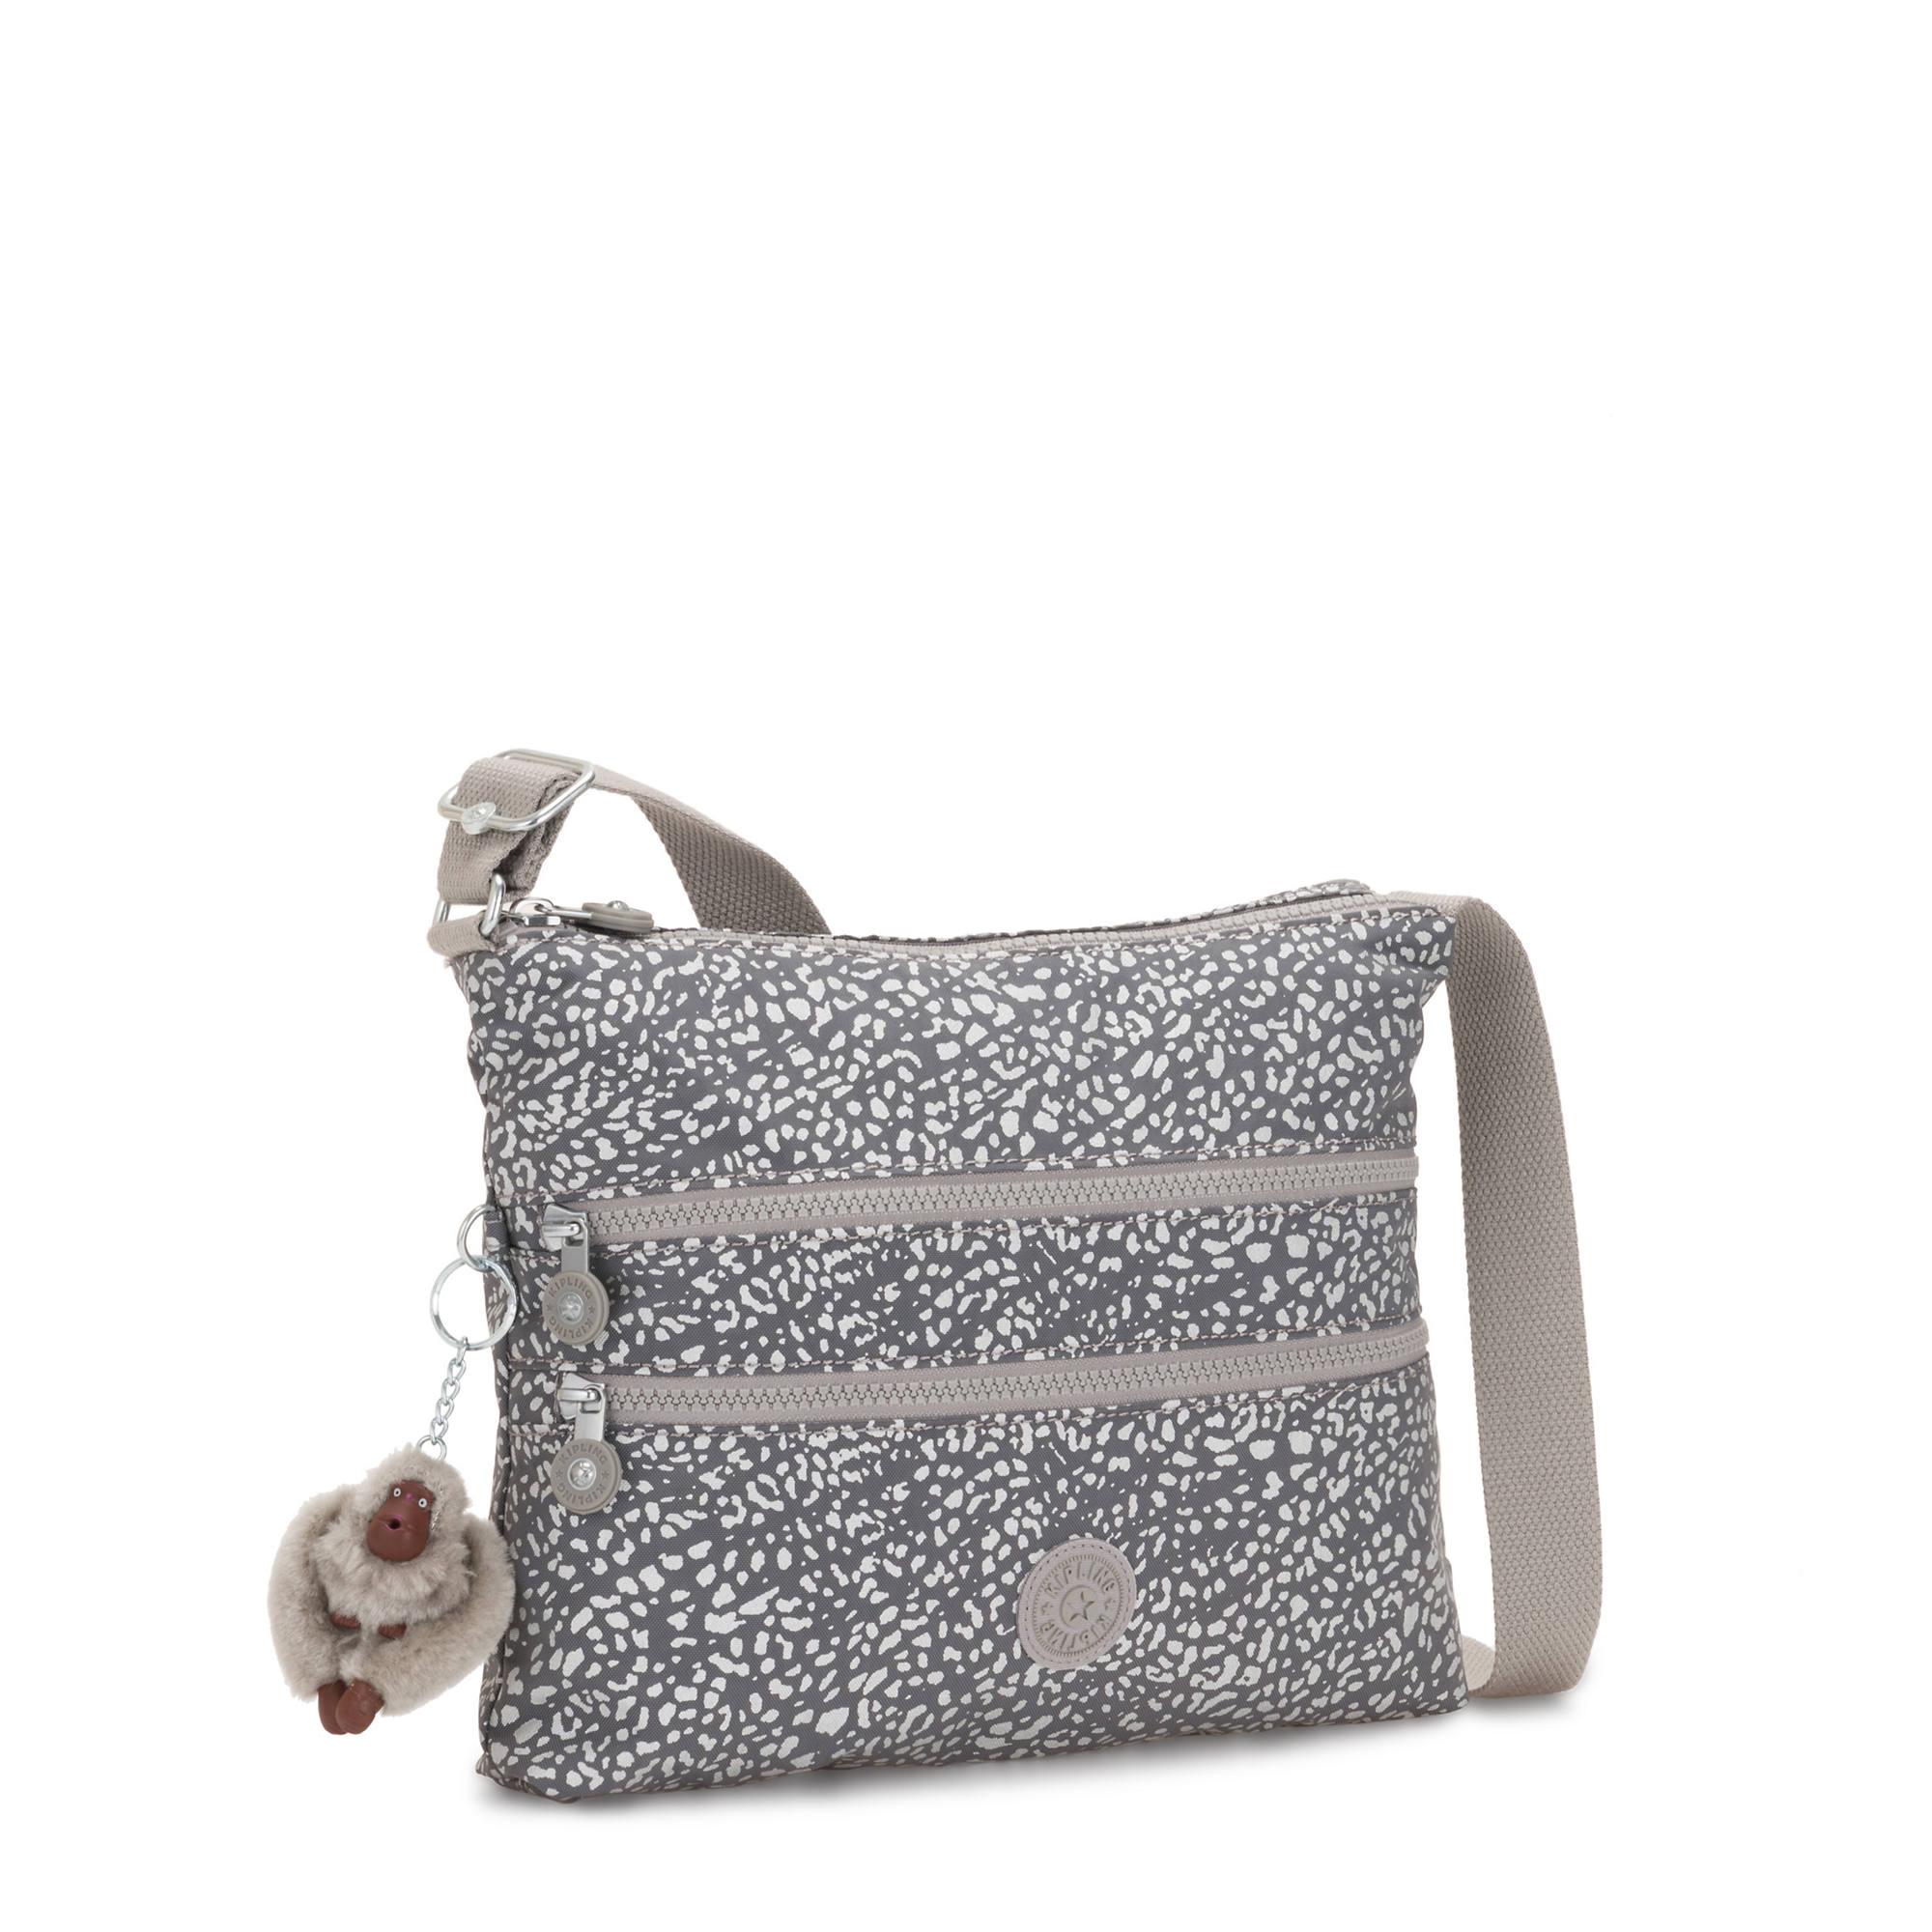 Kipling-Alvar-Metallic-Crossbody-Bag miniature 32